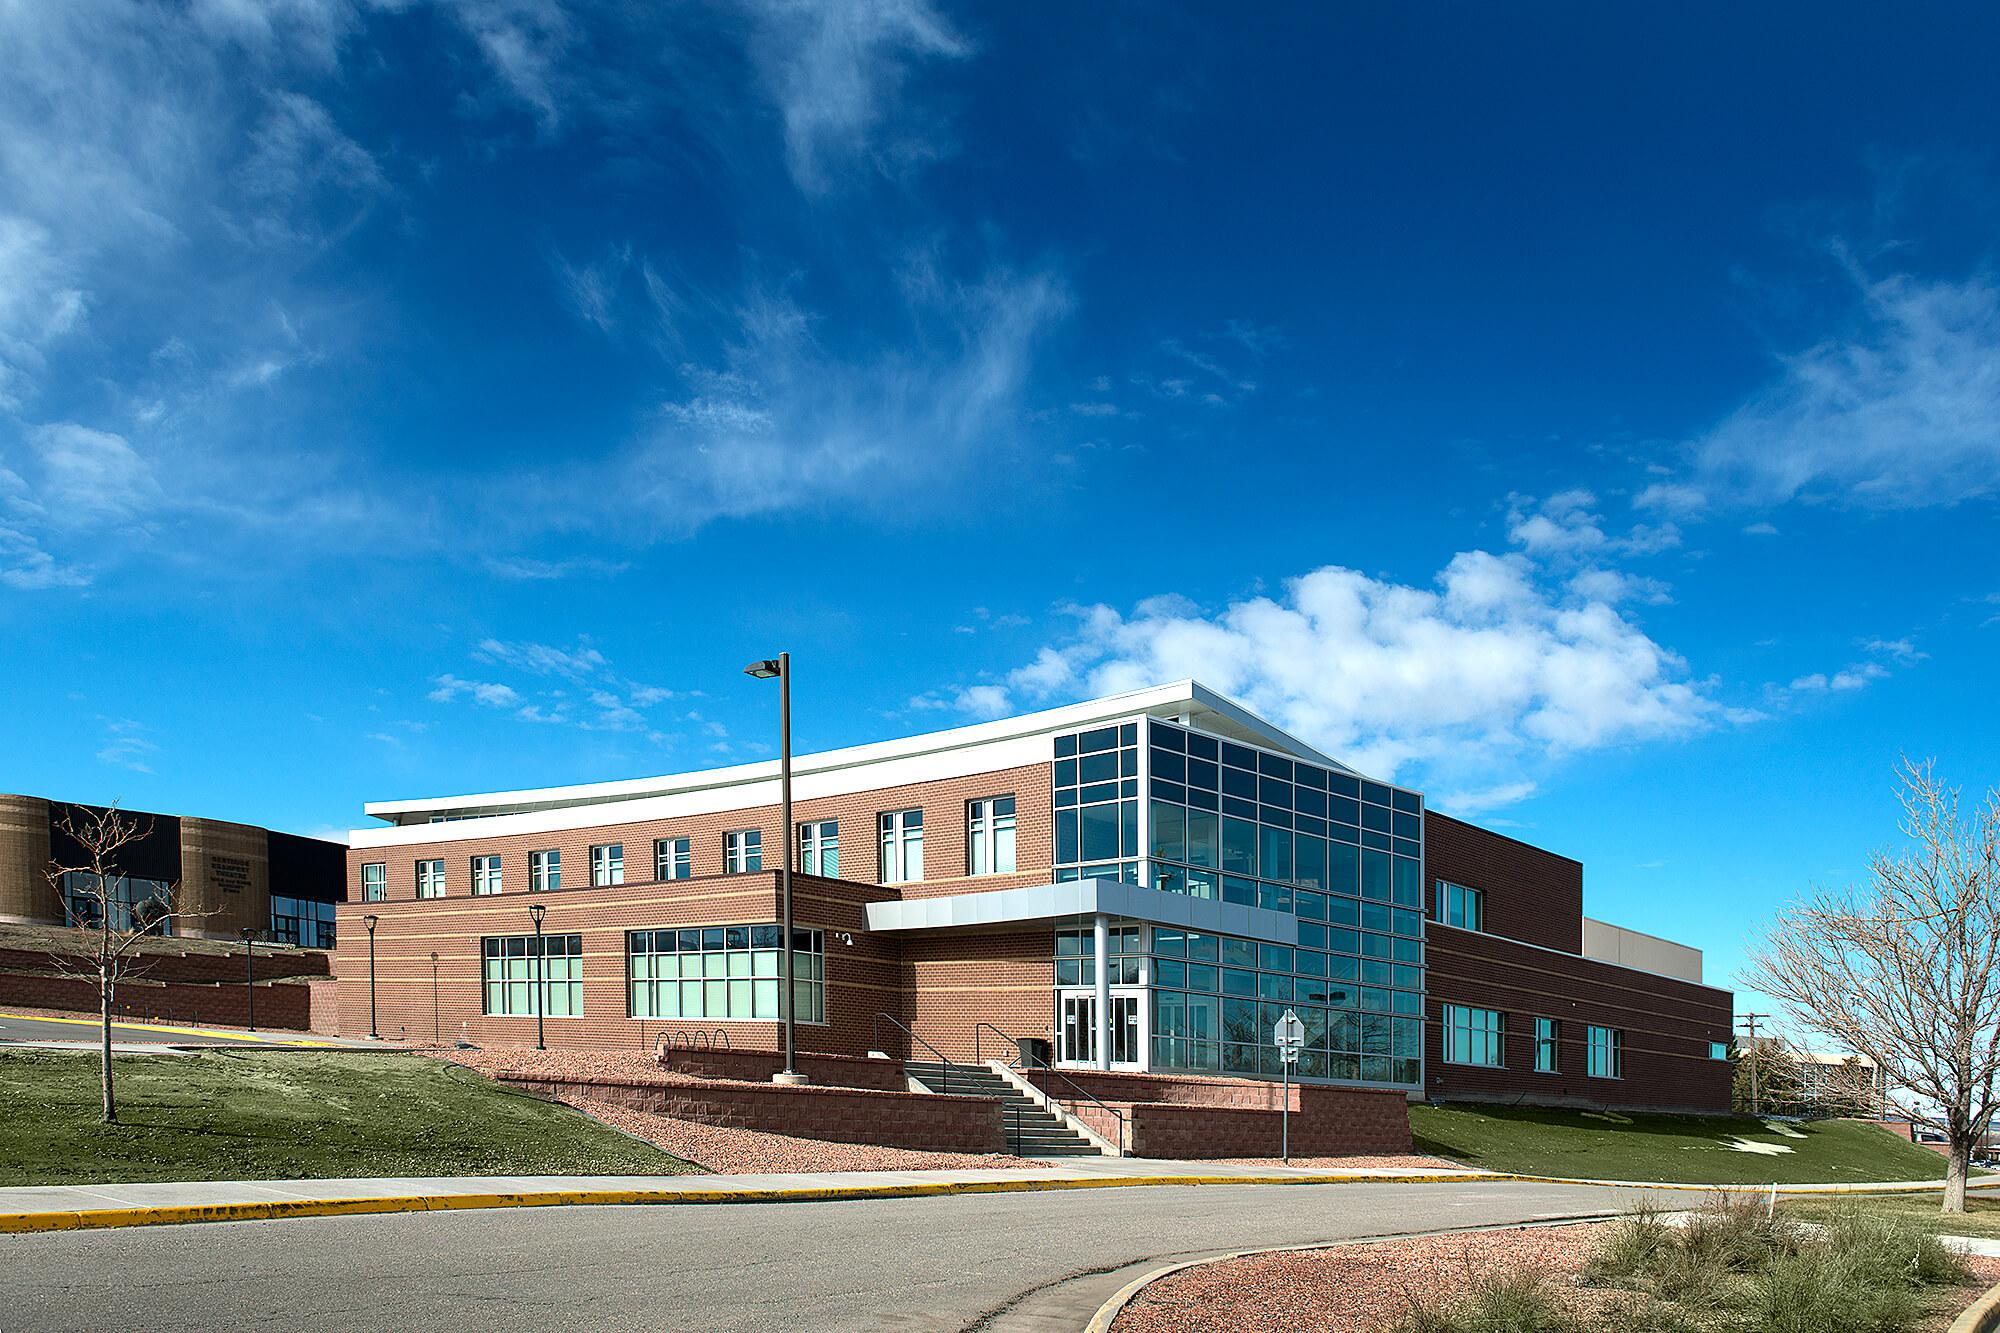 Photo of the Casper College Music Building.